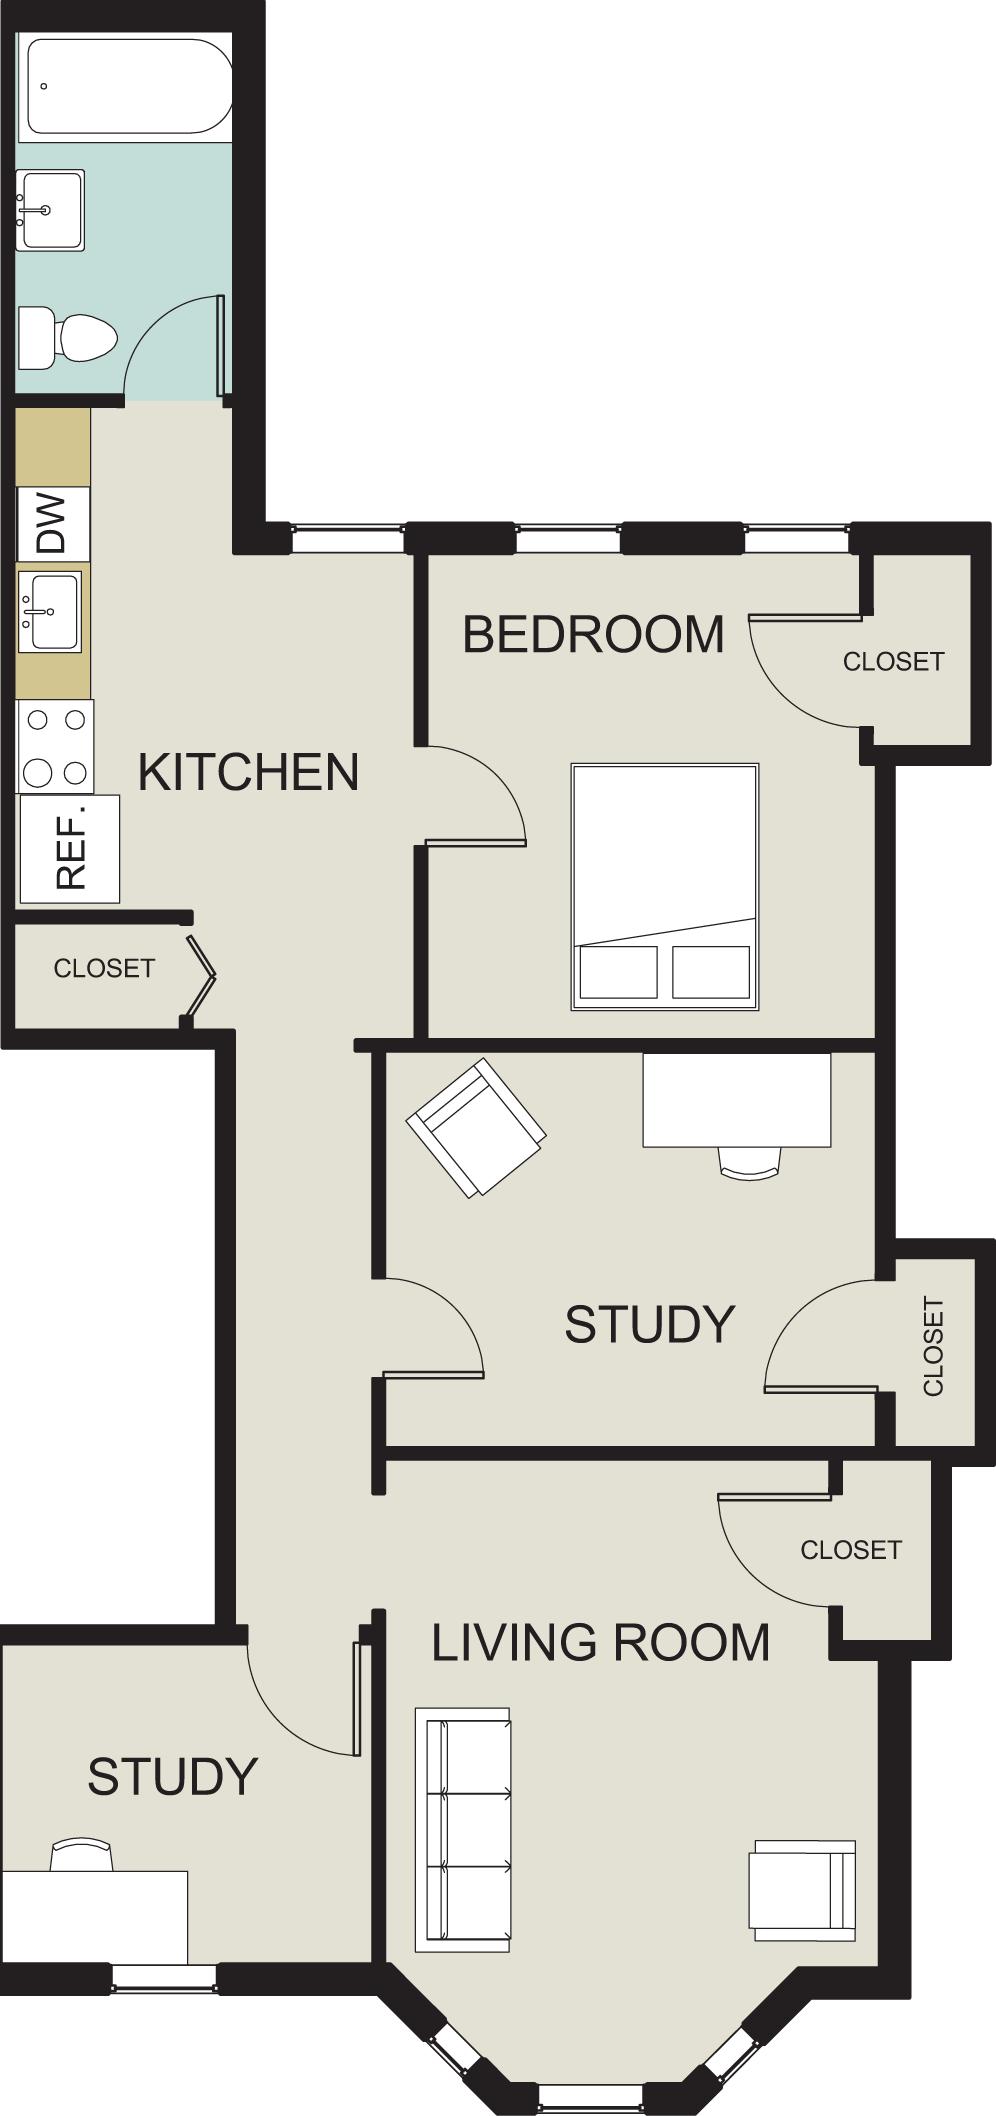 main street apartments, 784 / 790 / 796 main st., cambridge, ma